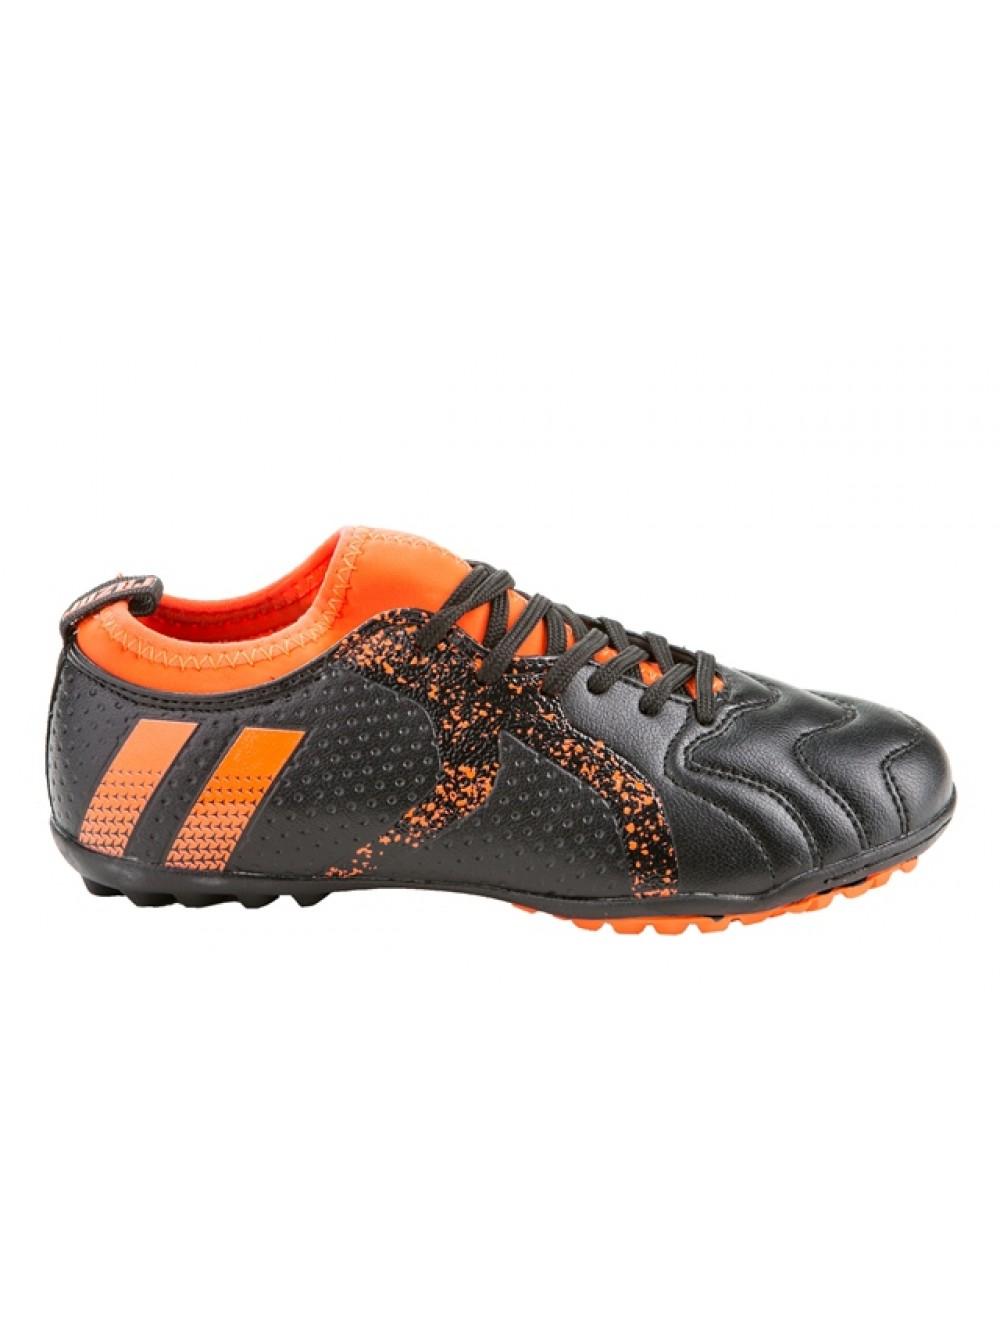 e1adf216 Обувь для футбола (сороконожка) Razor DWB17622 BLACK R.ORANGE 37-41 ...